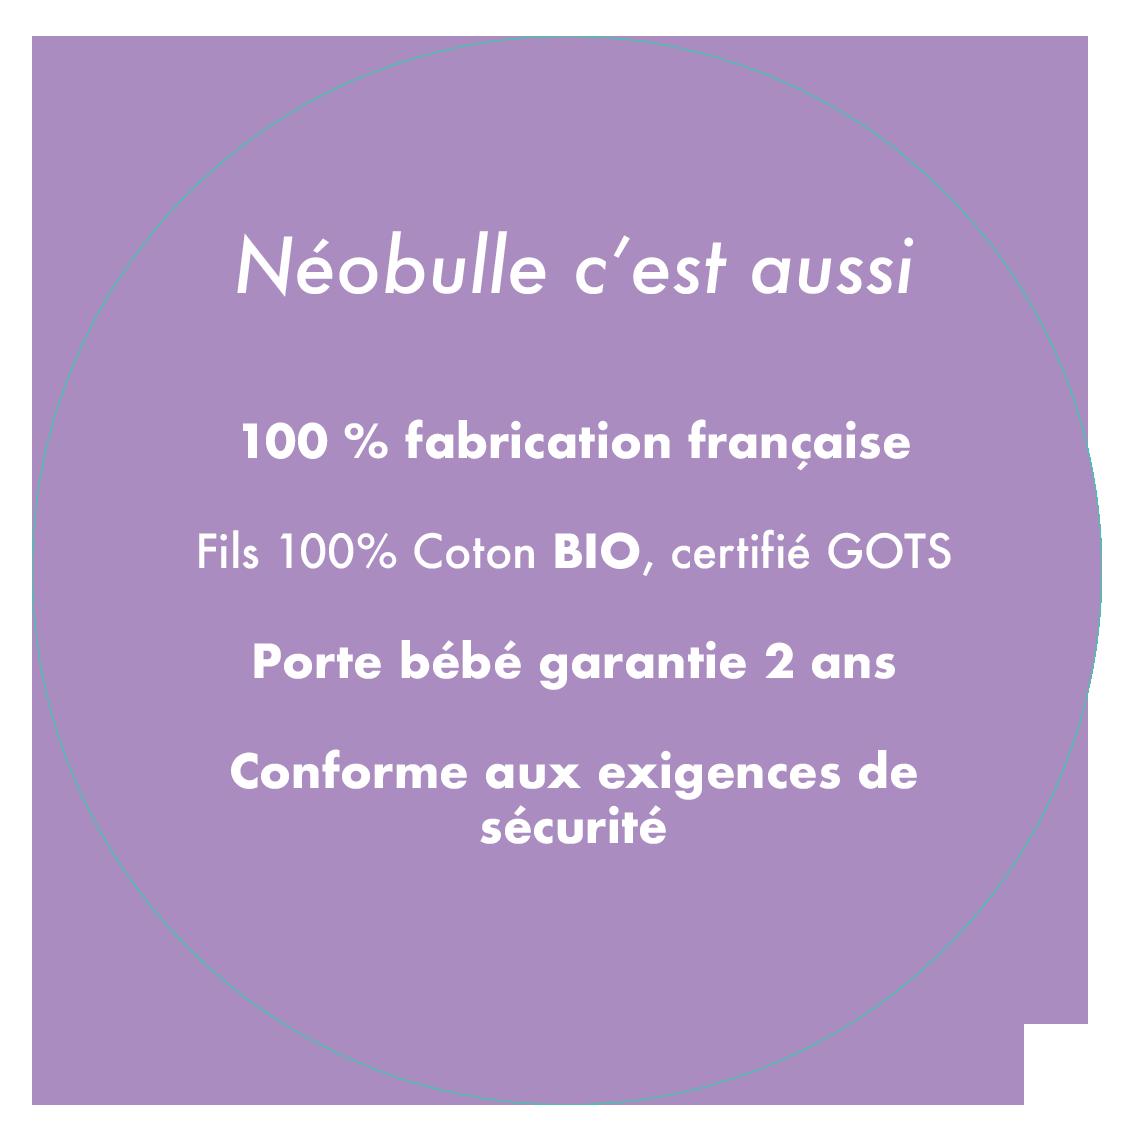 coton bio garantie 2ans_1.png